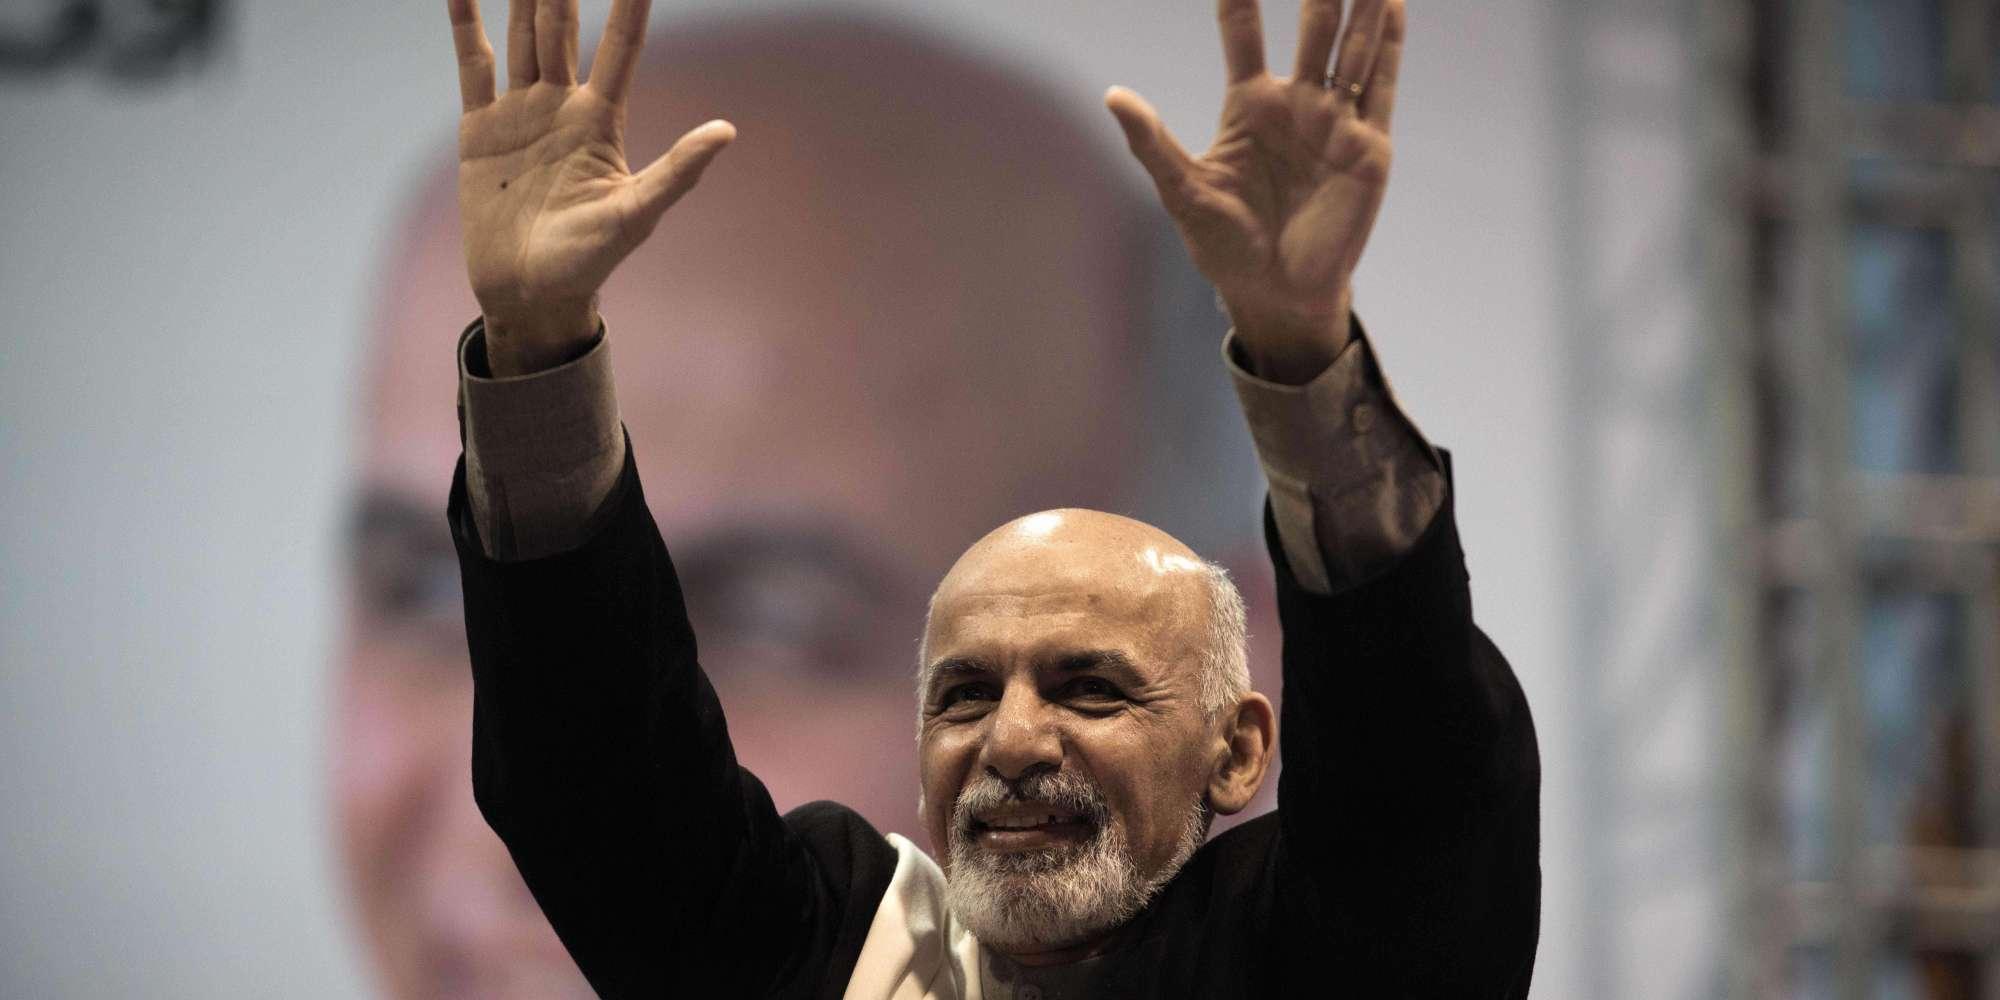 Emiratos Árabes Unidos confirma que  presidente afgano Ashraf Ghani se ha refugiado en su territorio